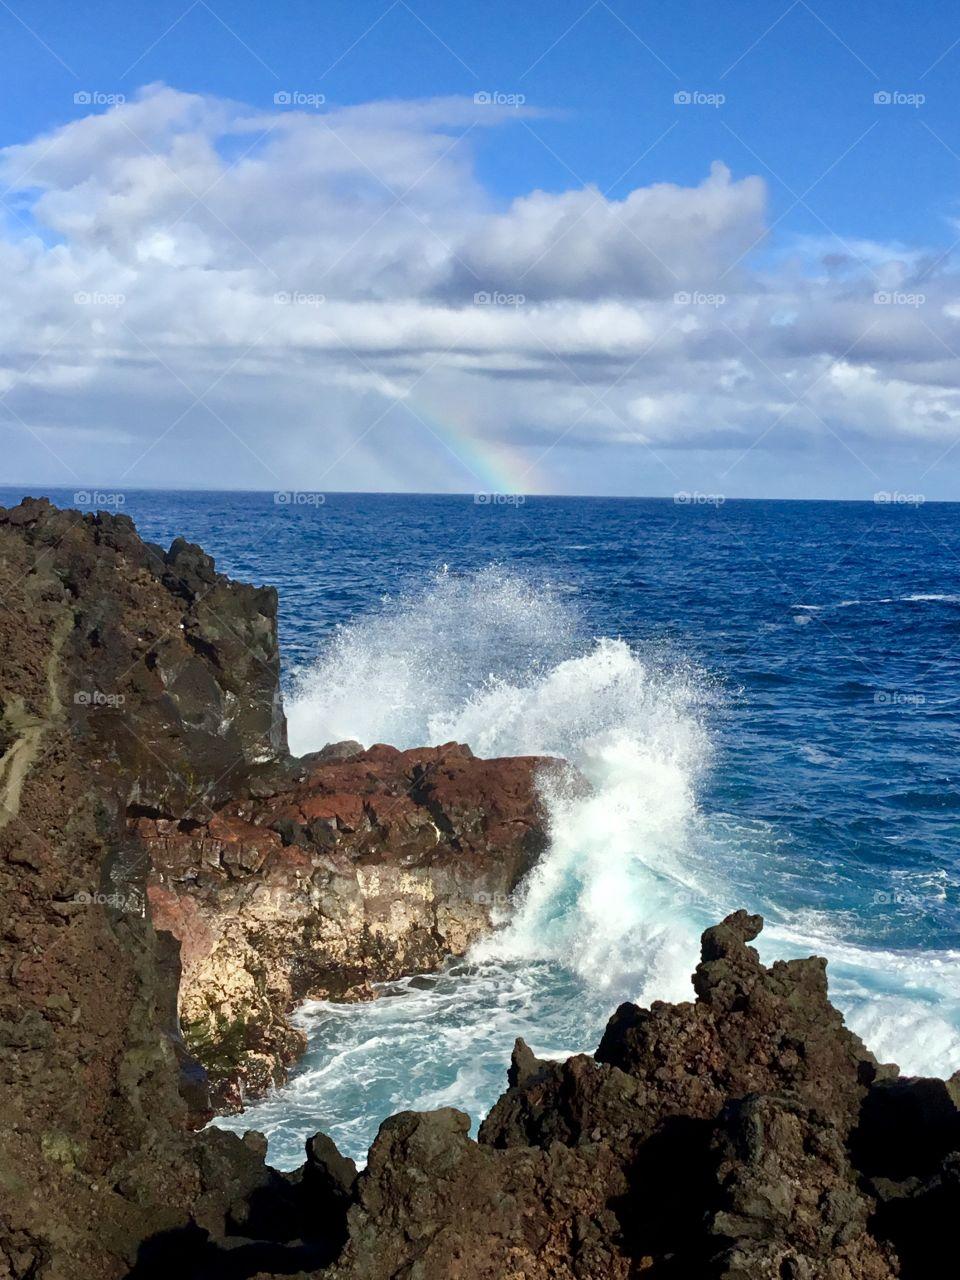 Splash in the foreground, rainbow on the horizon